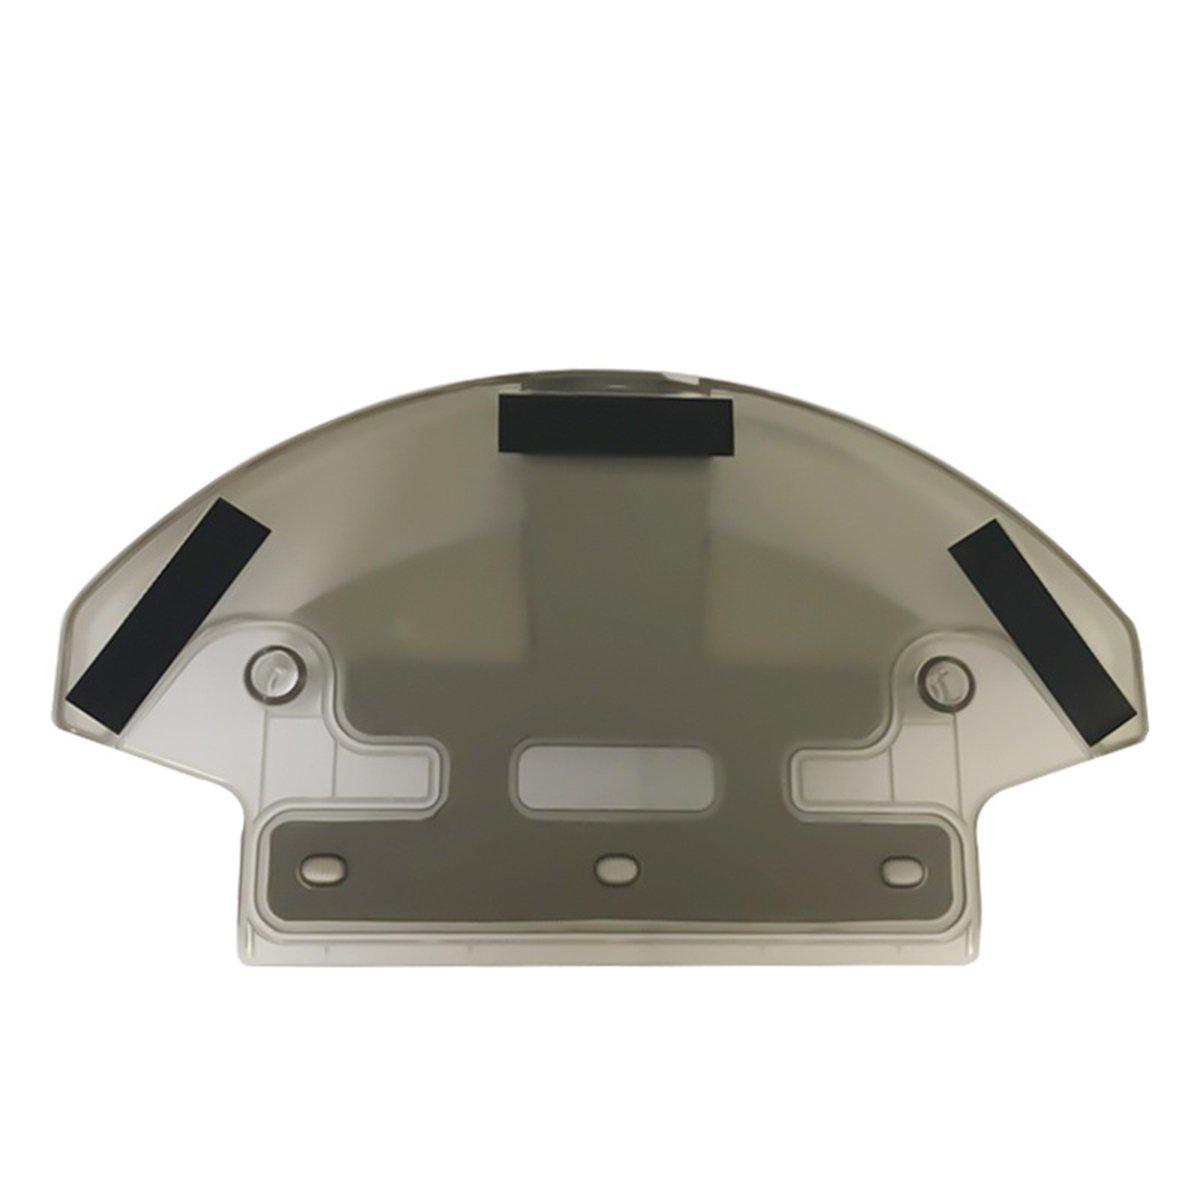 TeKeHom 1x Tanque de Agua + 1x paño de fregona para Ecovacs Deebot R95 R98 N78 M81 M81Pro M88 Robot Aspirador Repuestos para Tanque de Agua: Amazon.es: ...